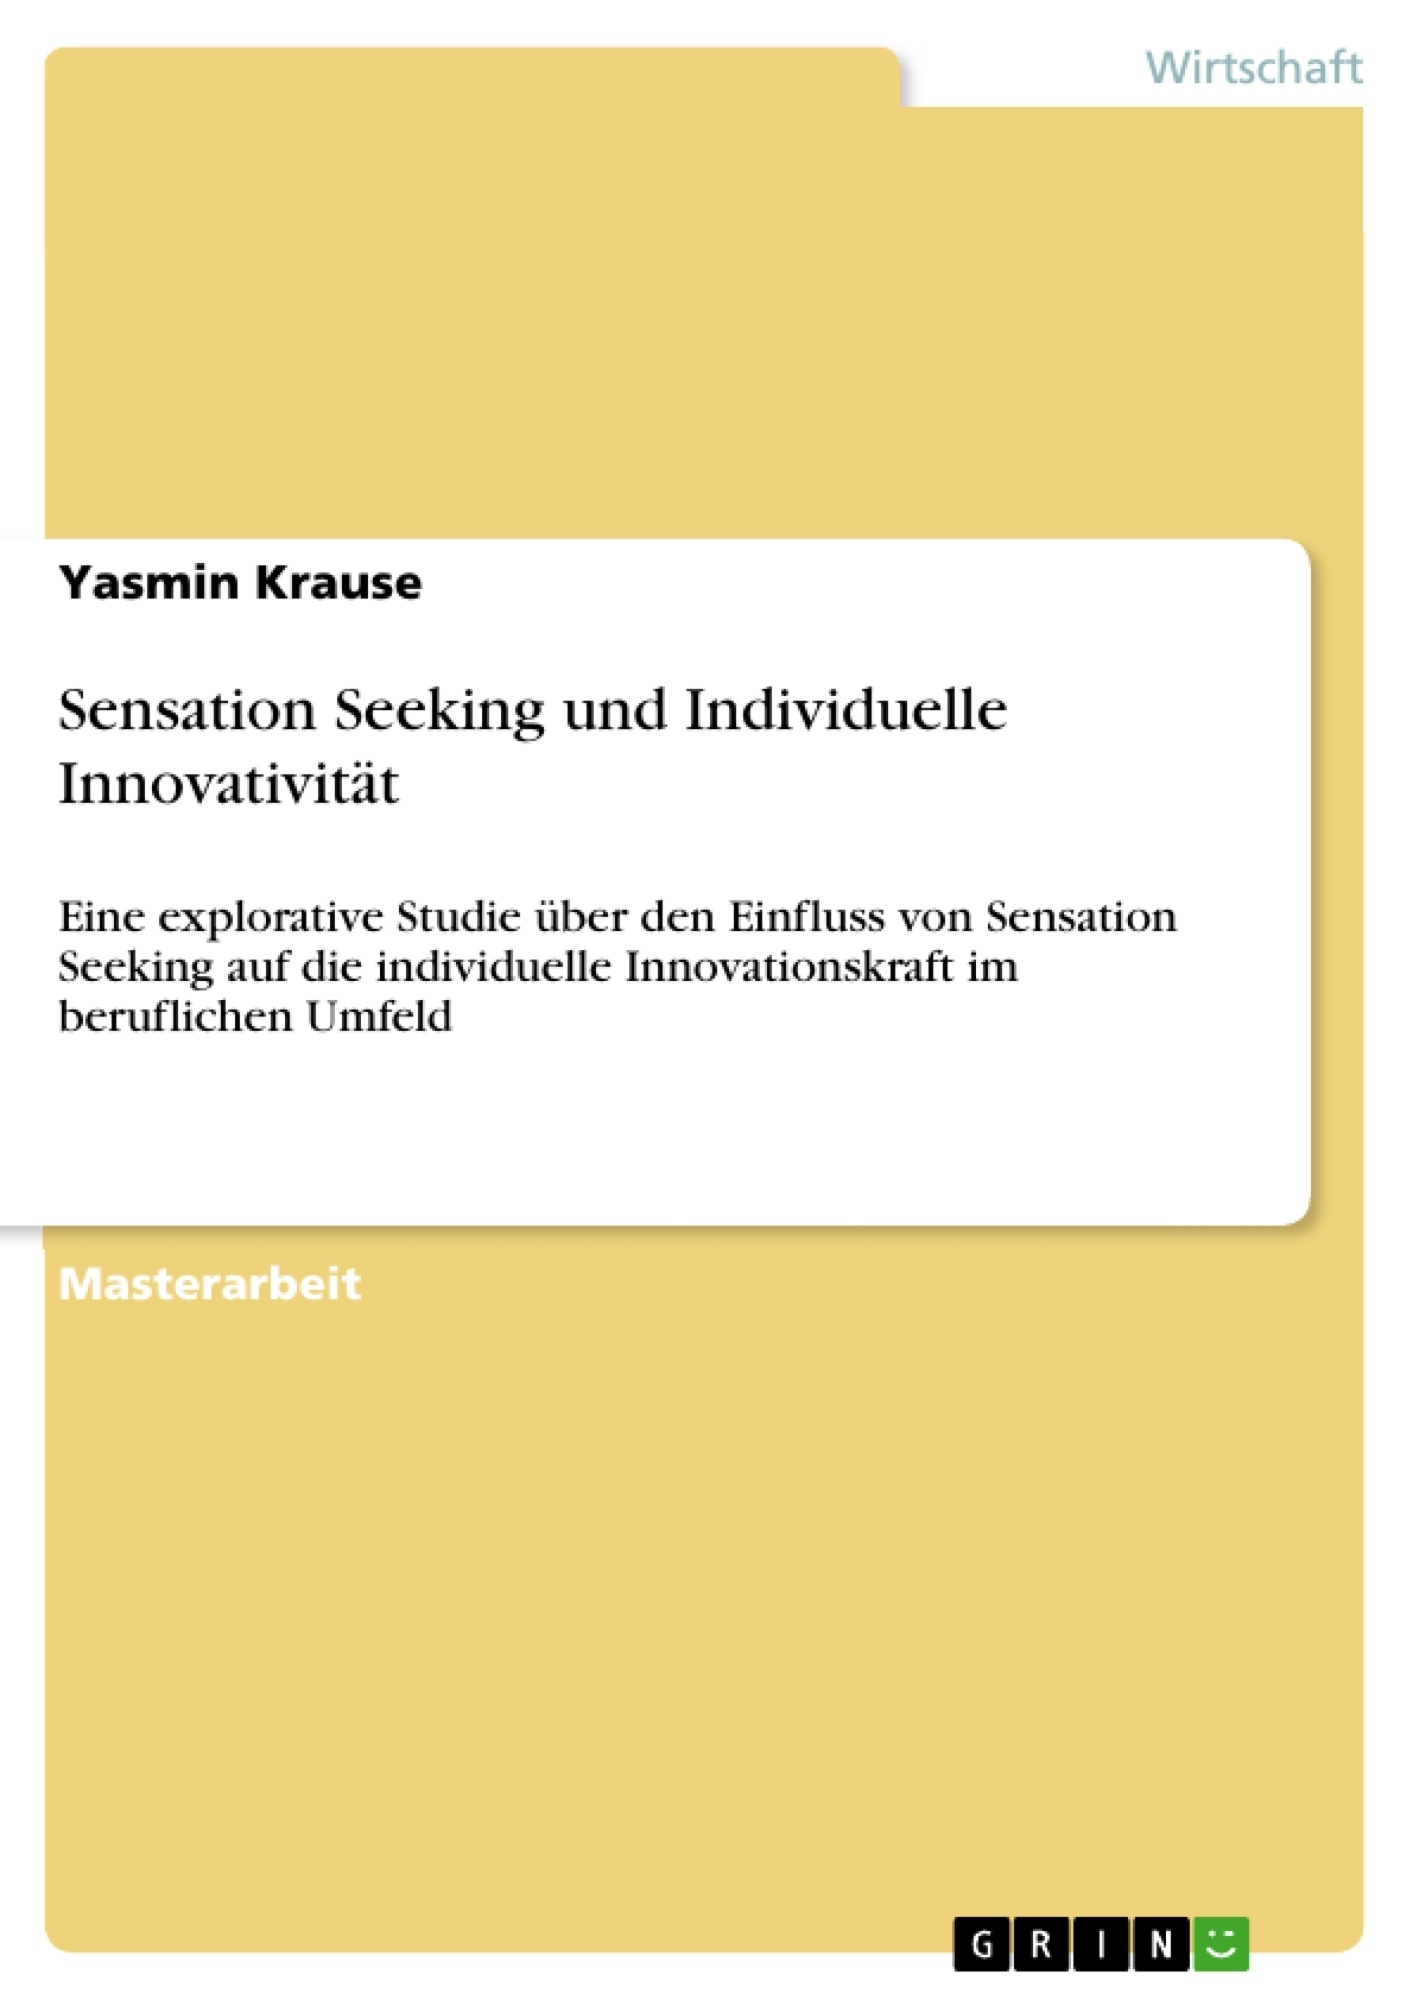 Titel: Sensation Seeking und Individuelle Innovativität